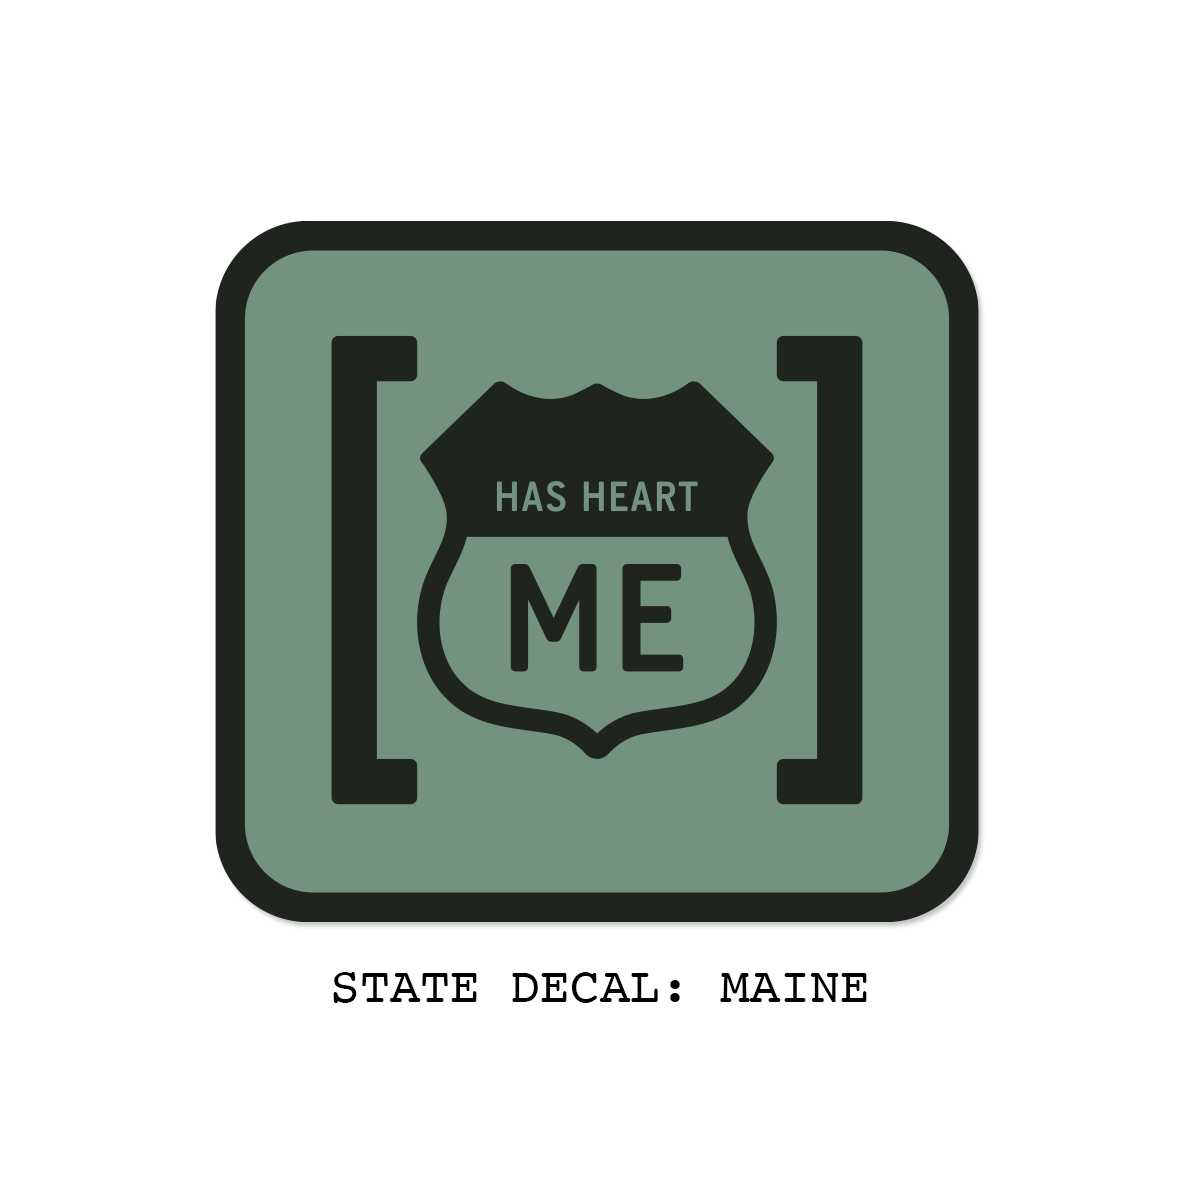 hasheart-statedecal-ME